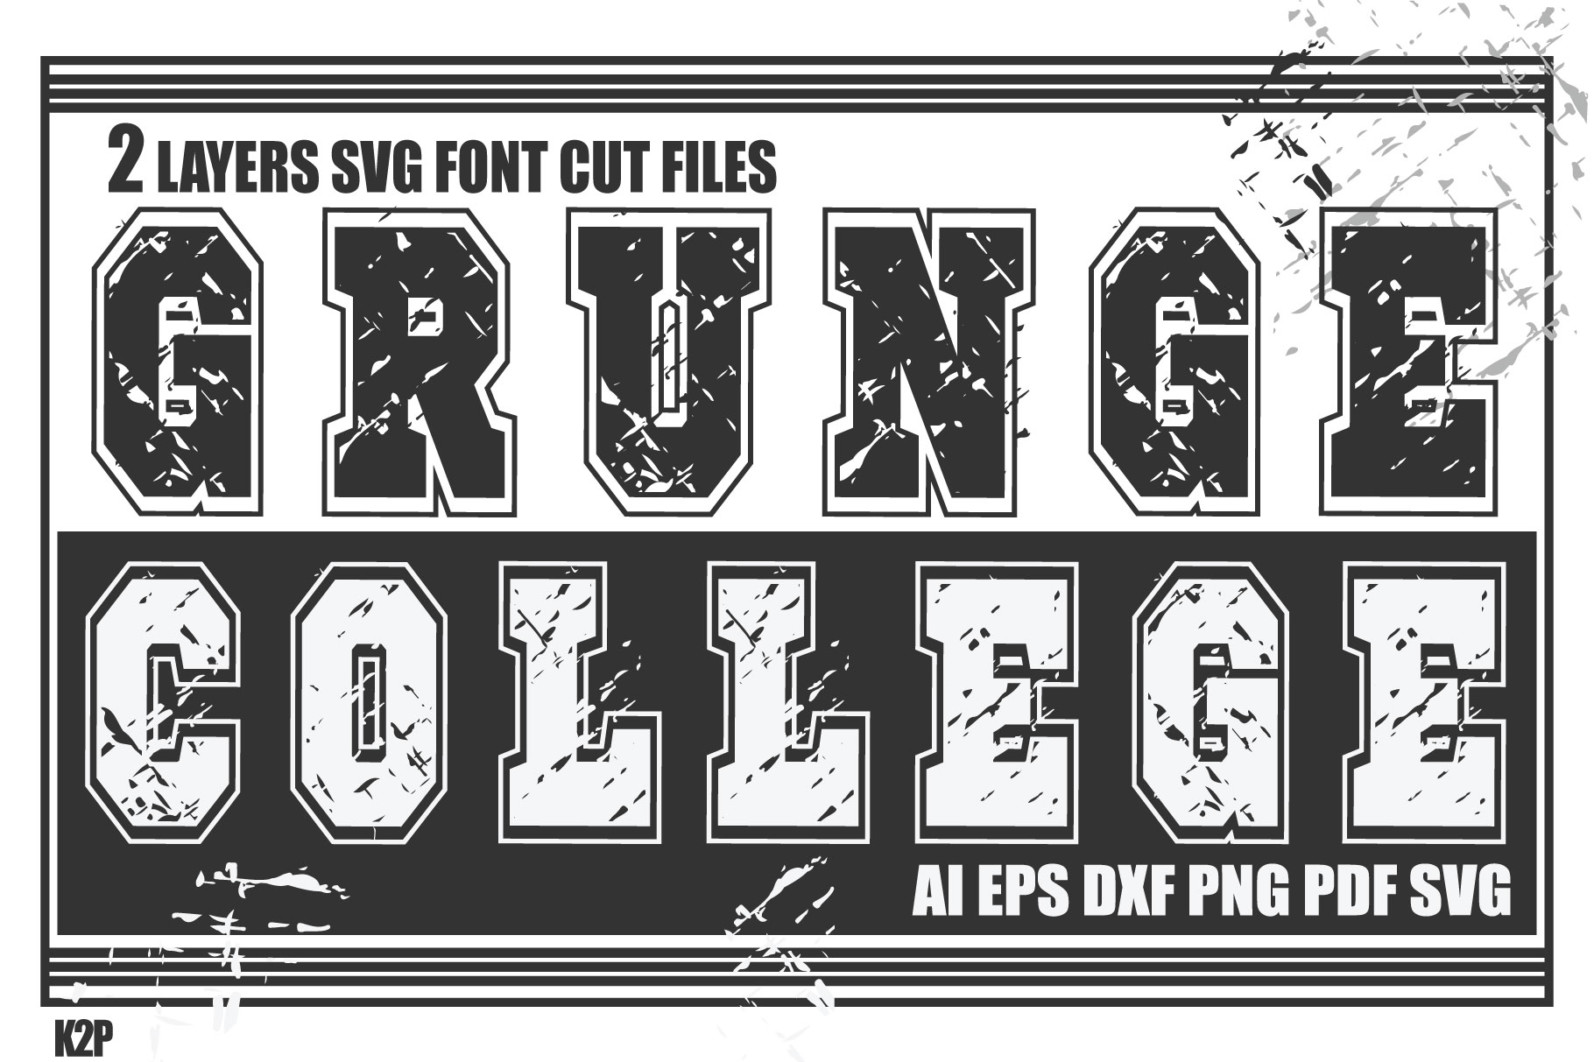 Grunge College 2 layers SVG Cut Files - GRUNGE COLLEGE AD SVG -